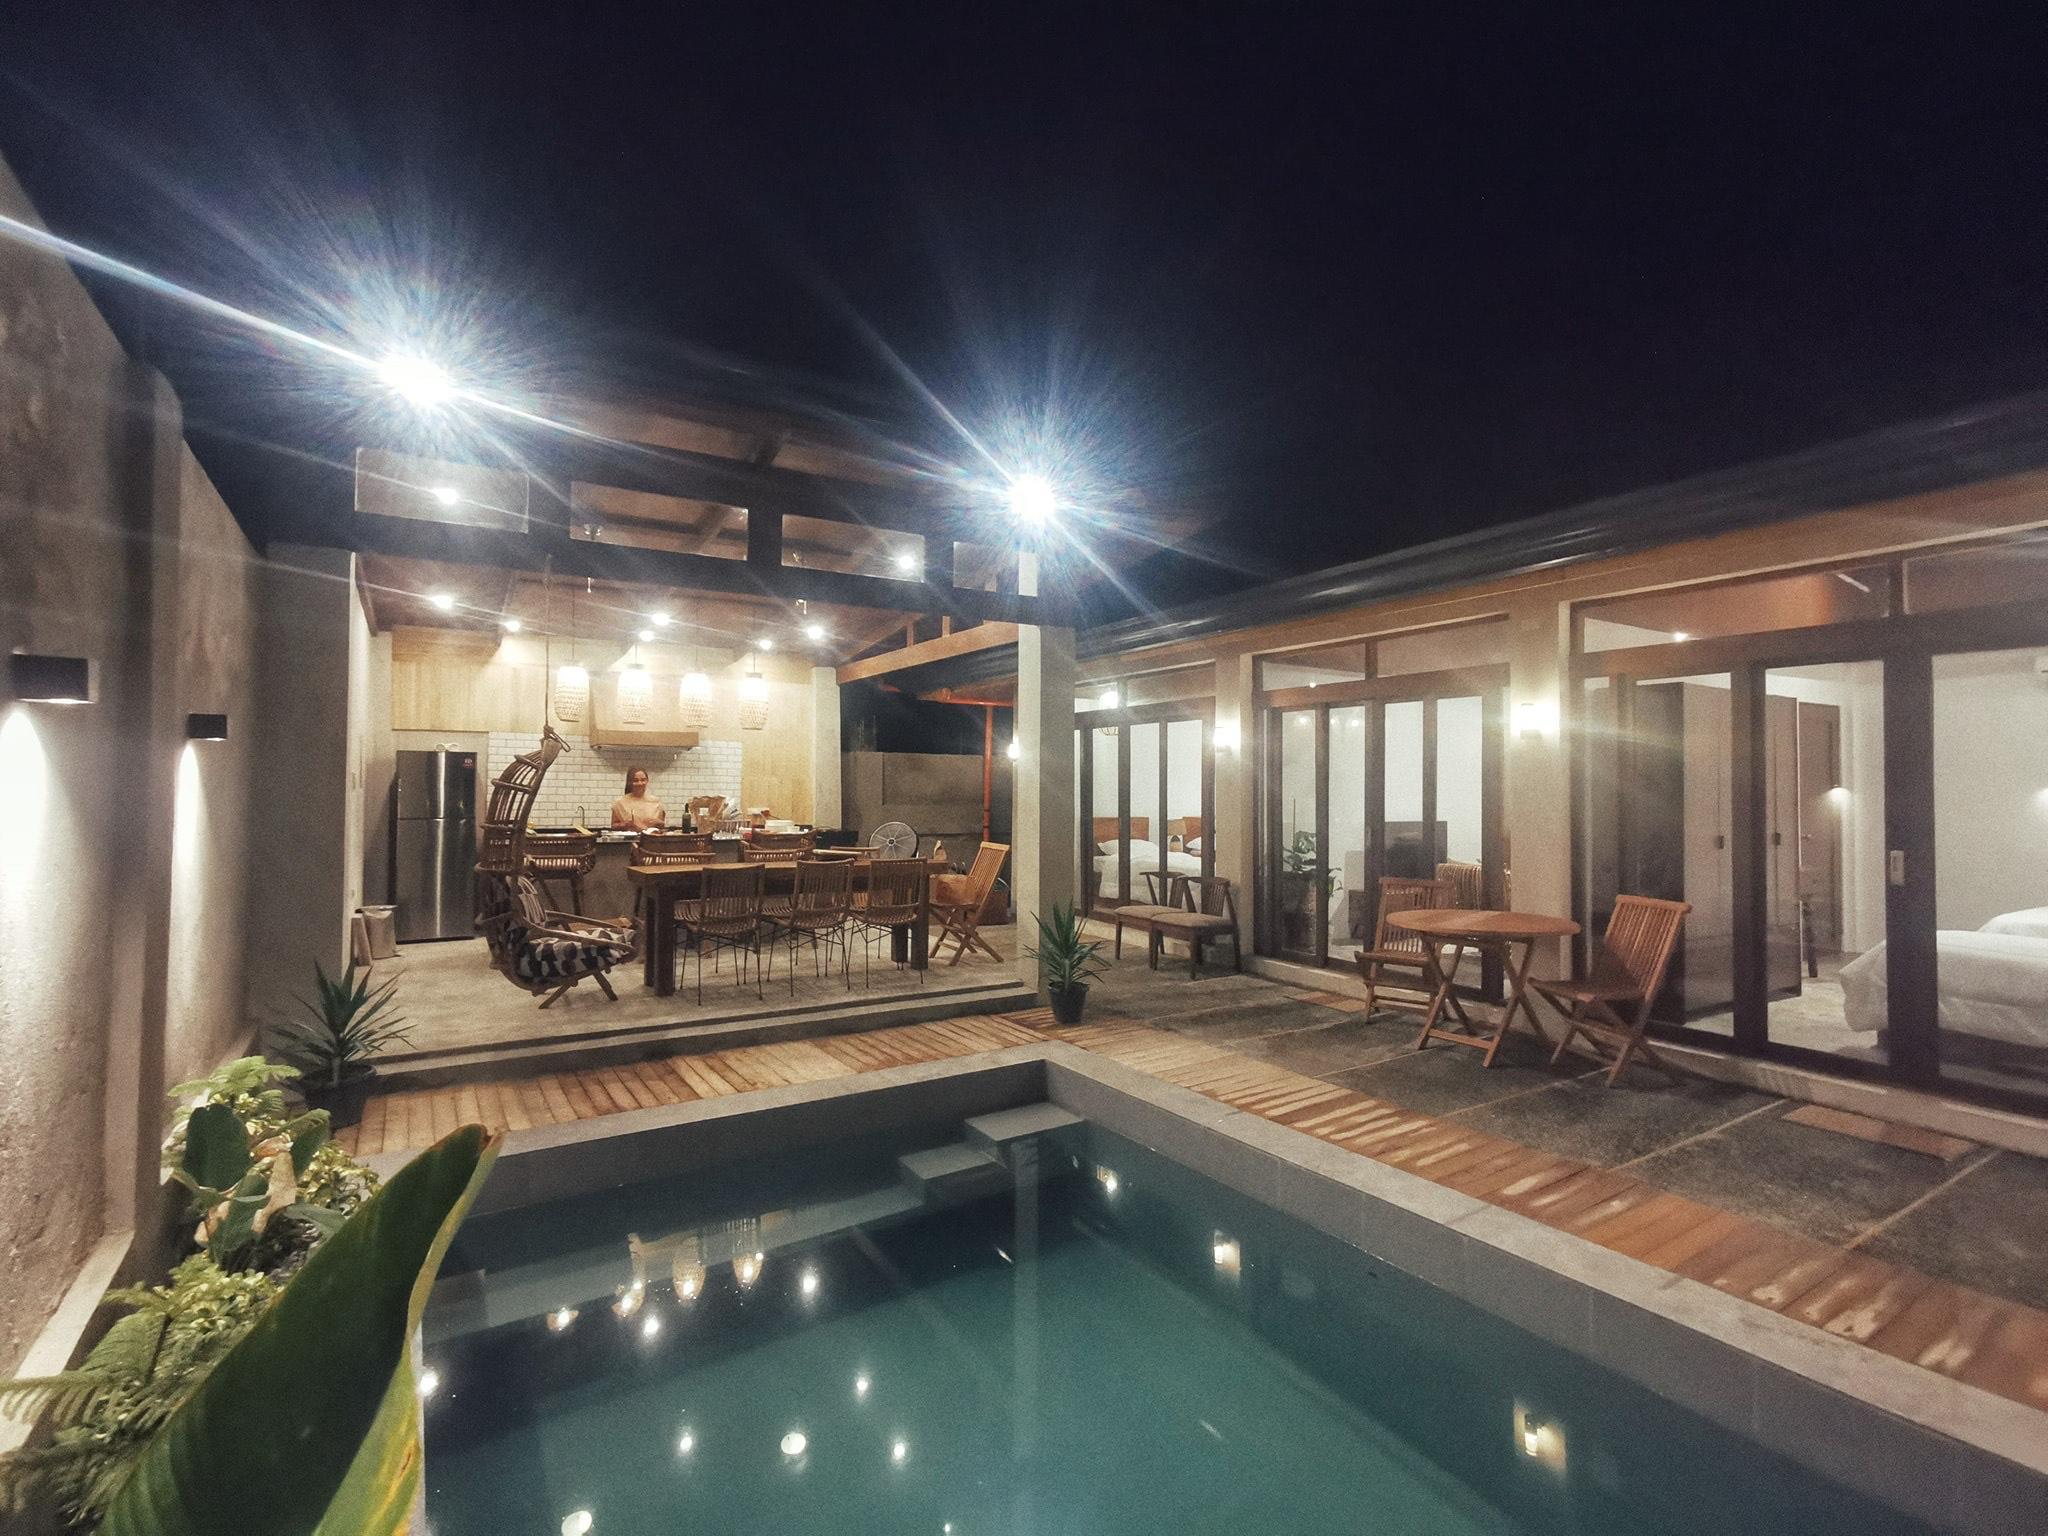 2 Bedroom Villa With Private Pool In San Juan LU